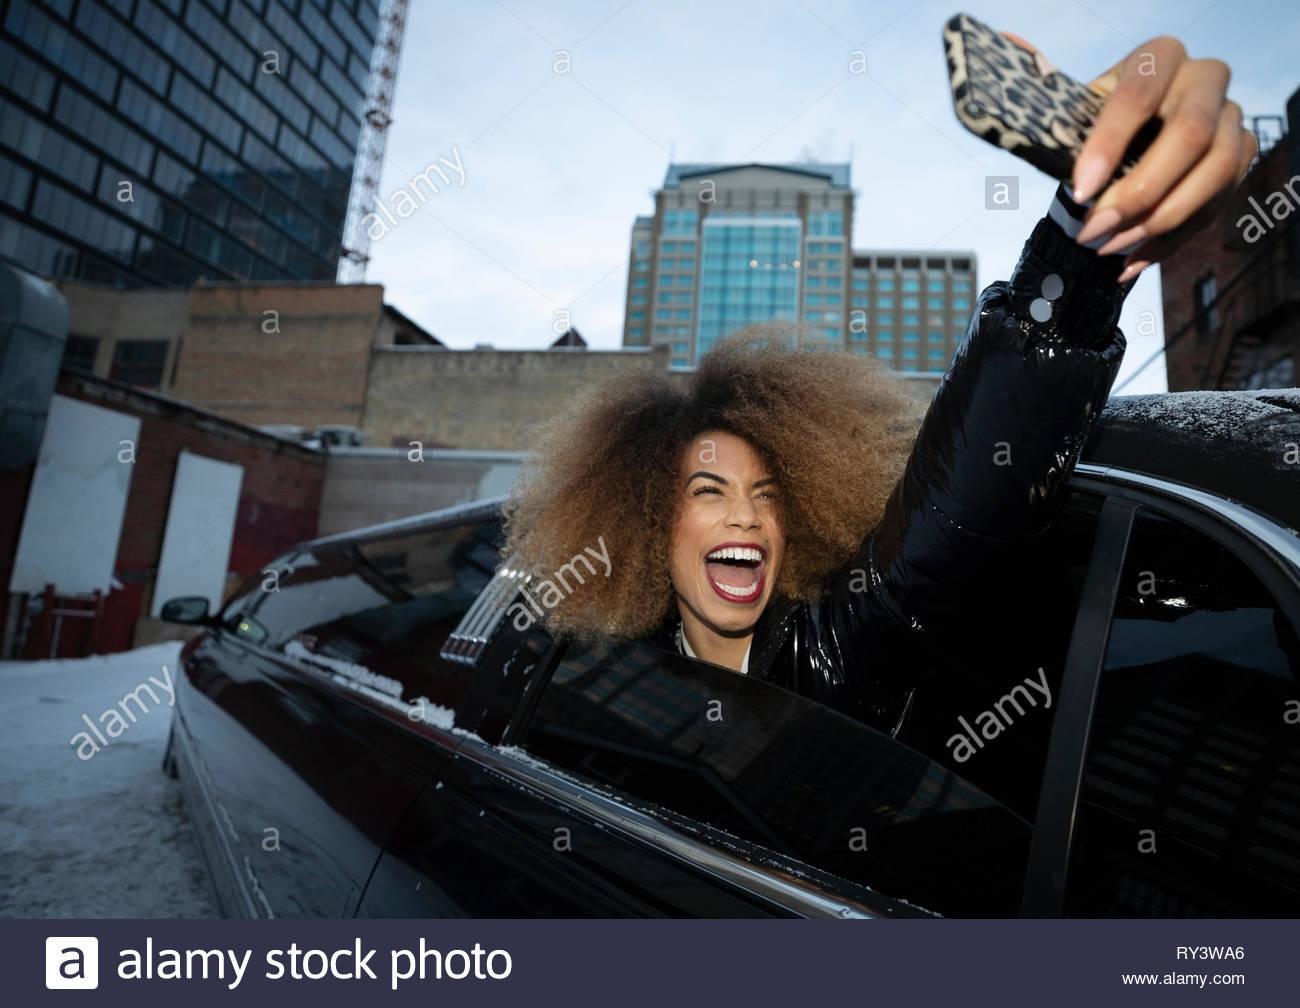 Exuberante mujer joven tomando selfie en ventana de limusina Imagen De Stock